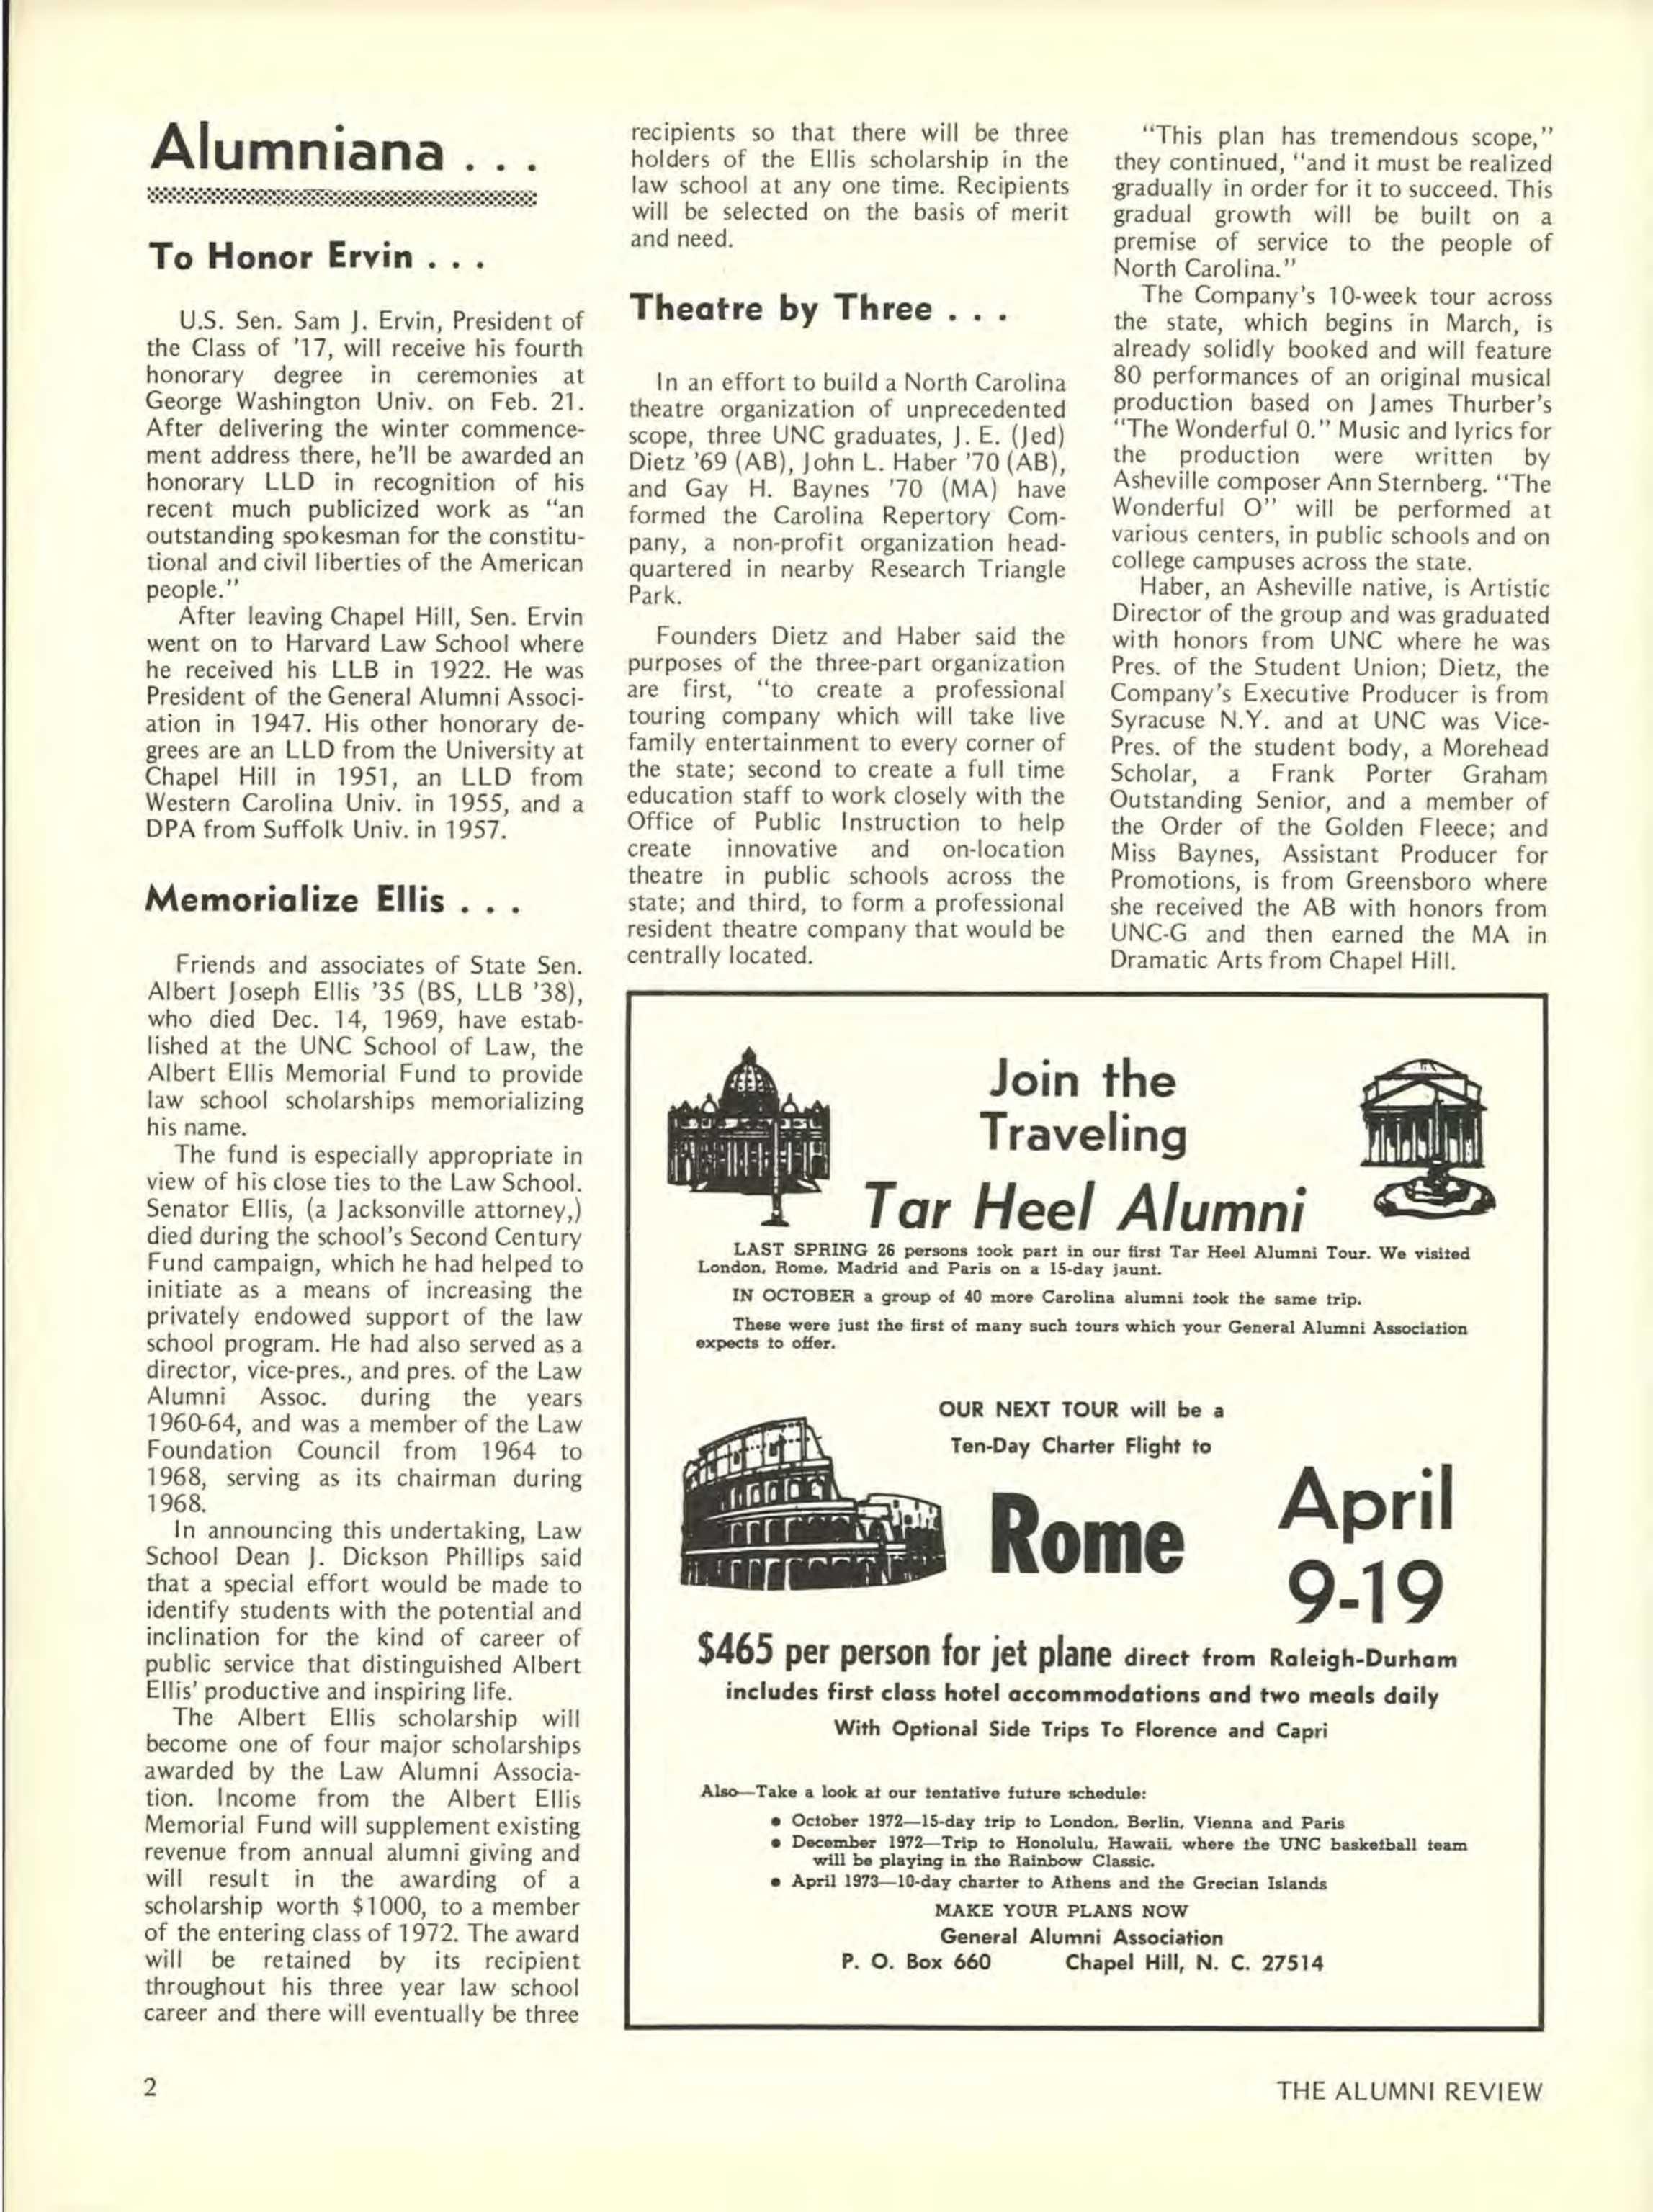 Carolina Alumni Review - January 1971 - page 2